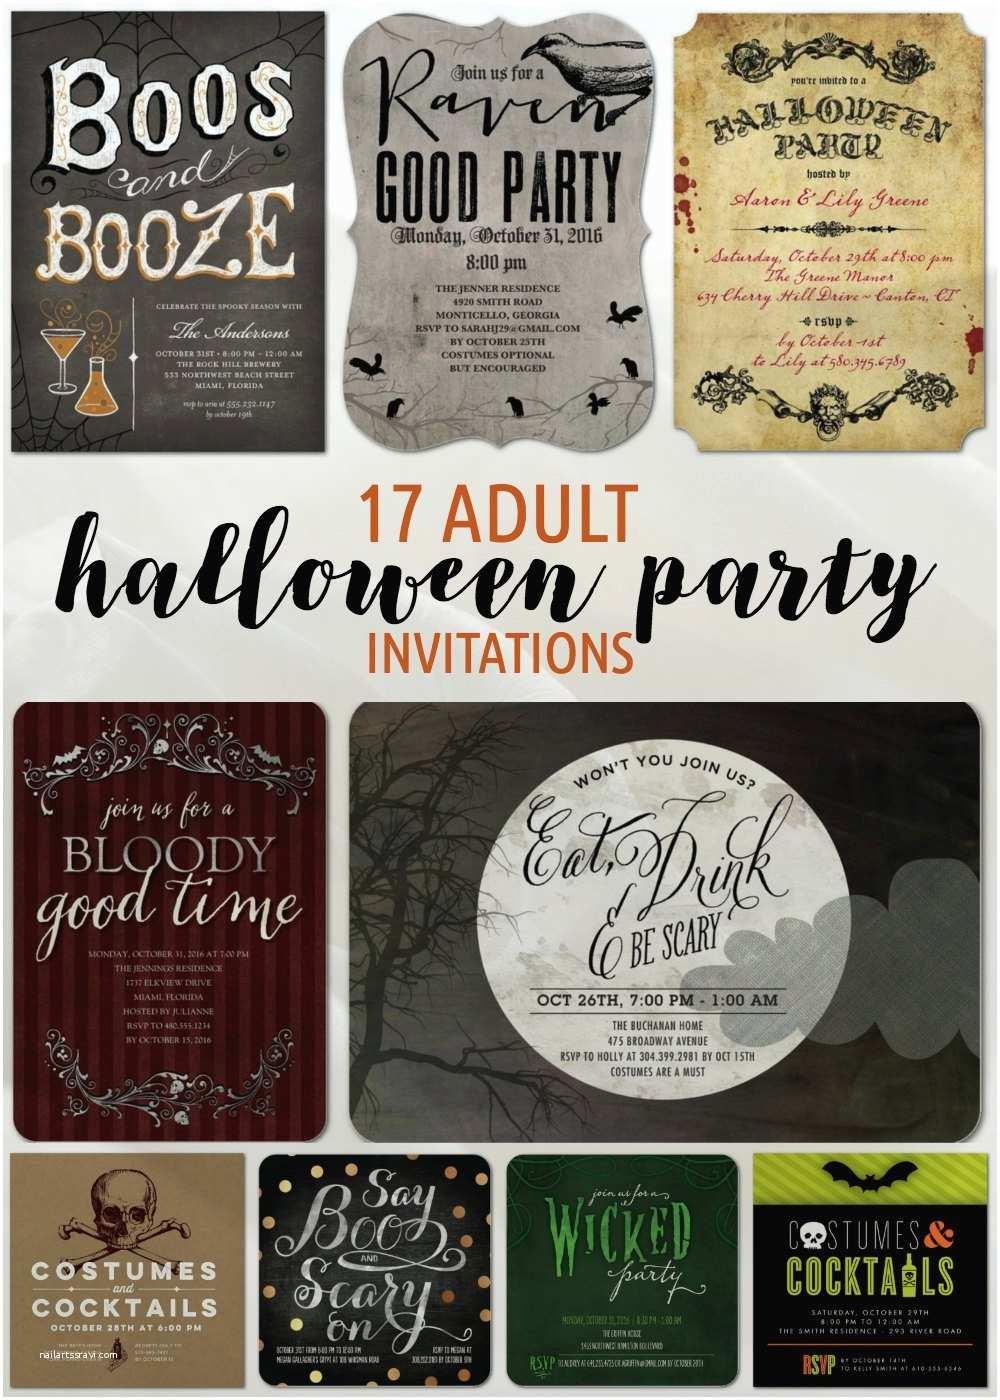 Halloween Party Invitation Ideas 17 Adult Halloween Party Invitations Newlywed Survival